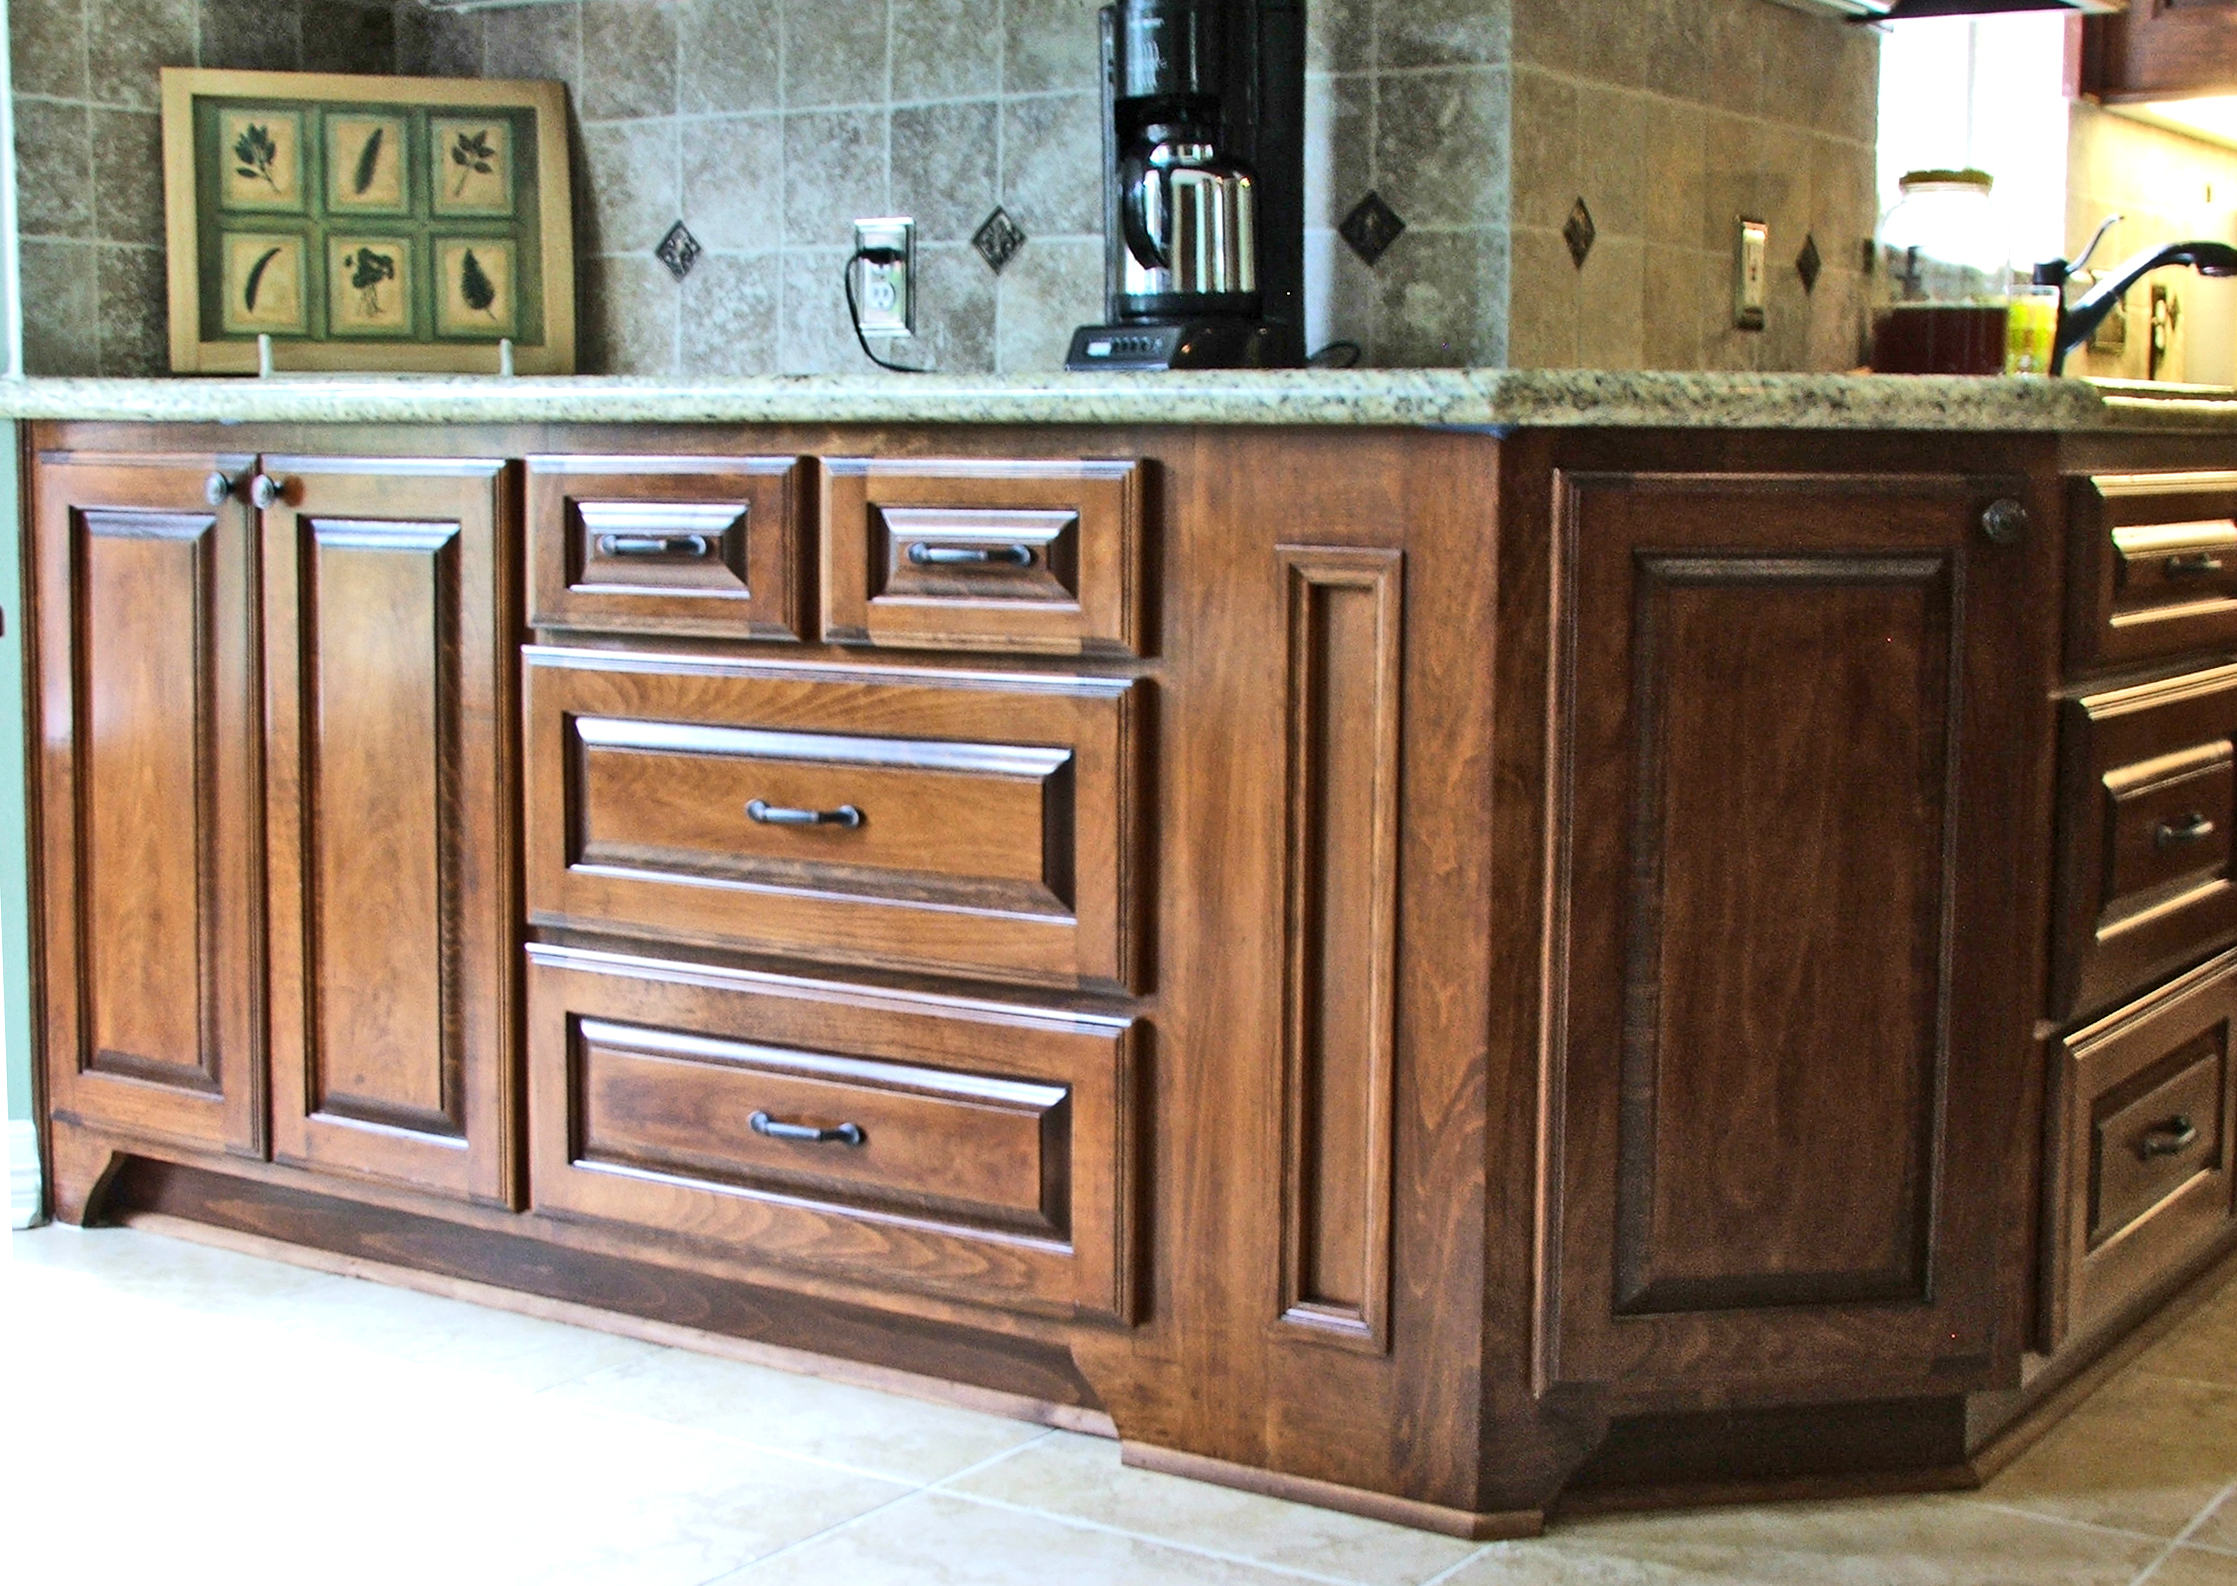 Beech kitchen cabinets 055 rva choice kitchen bath for Choice kitchen cabinets